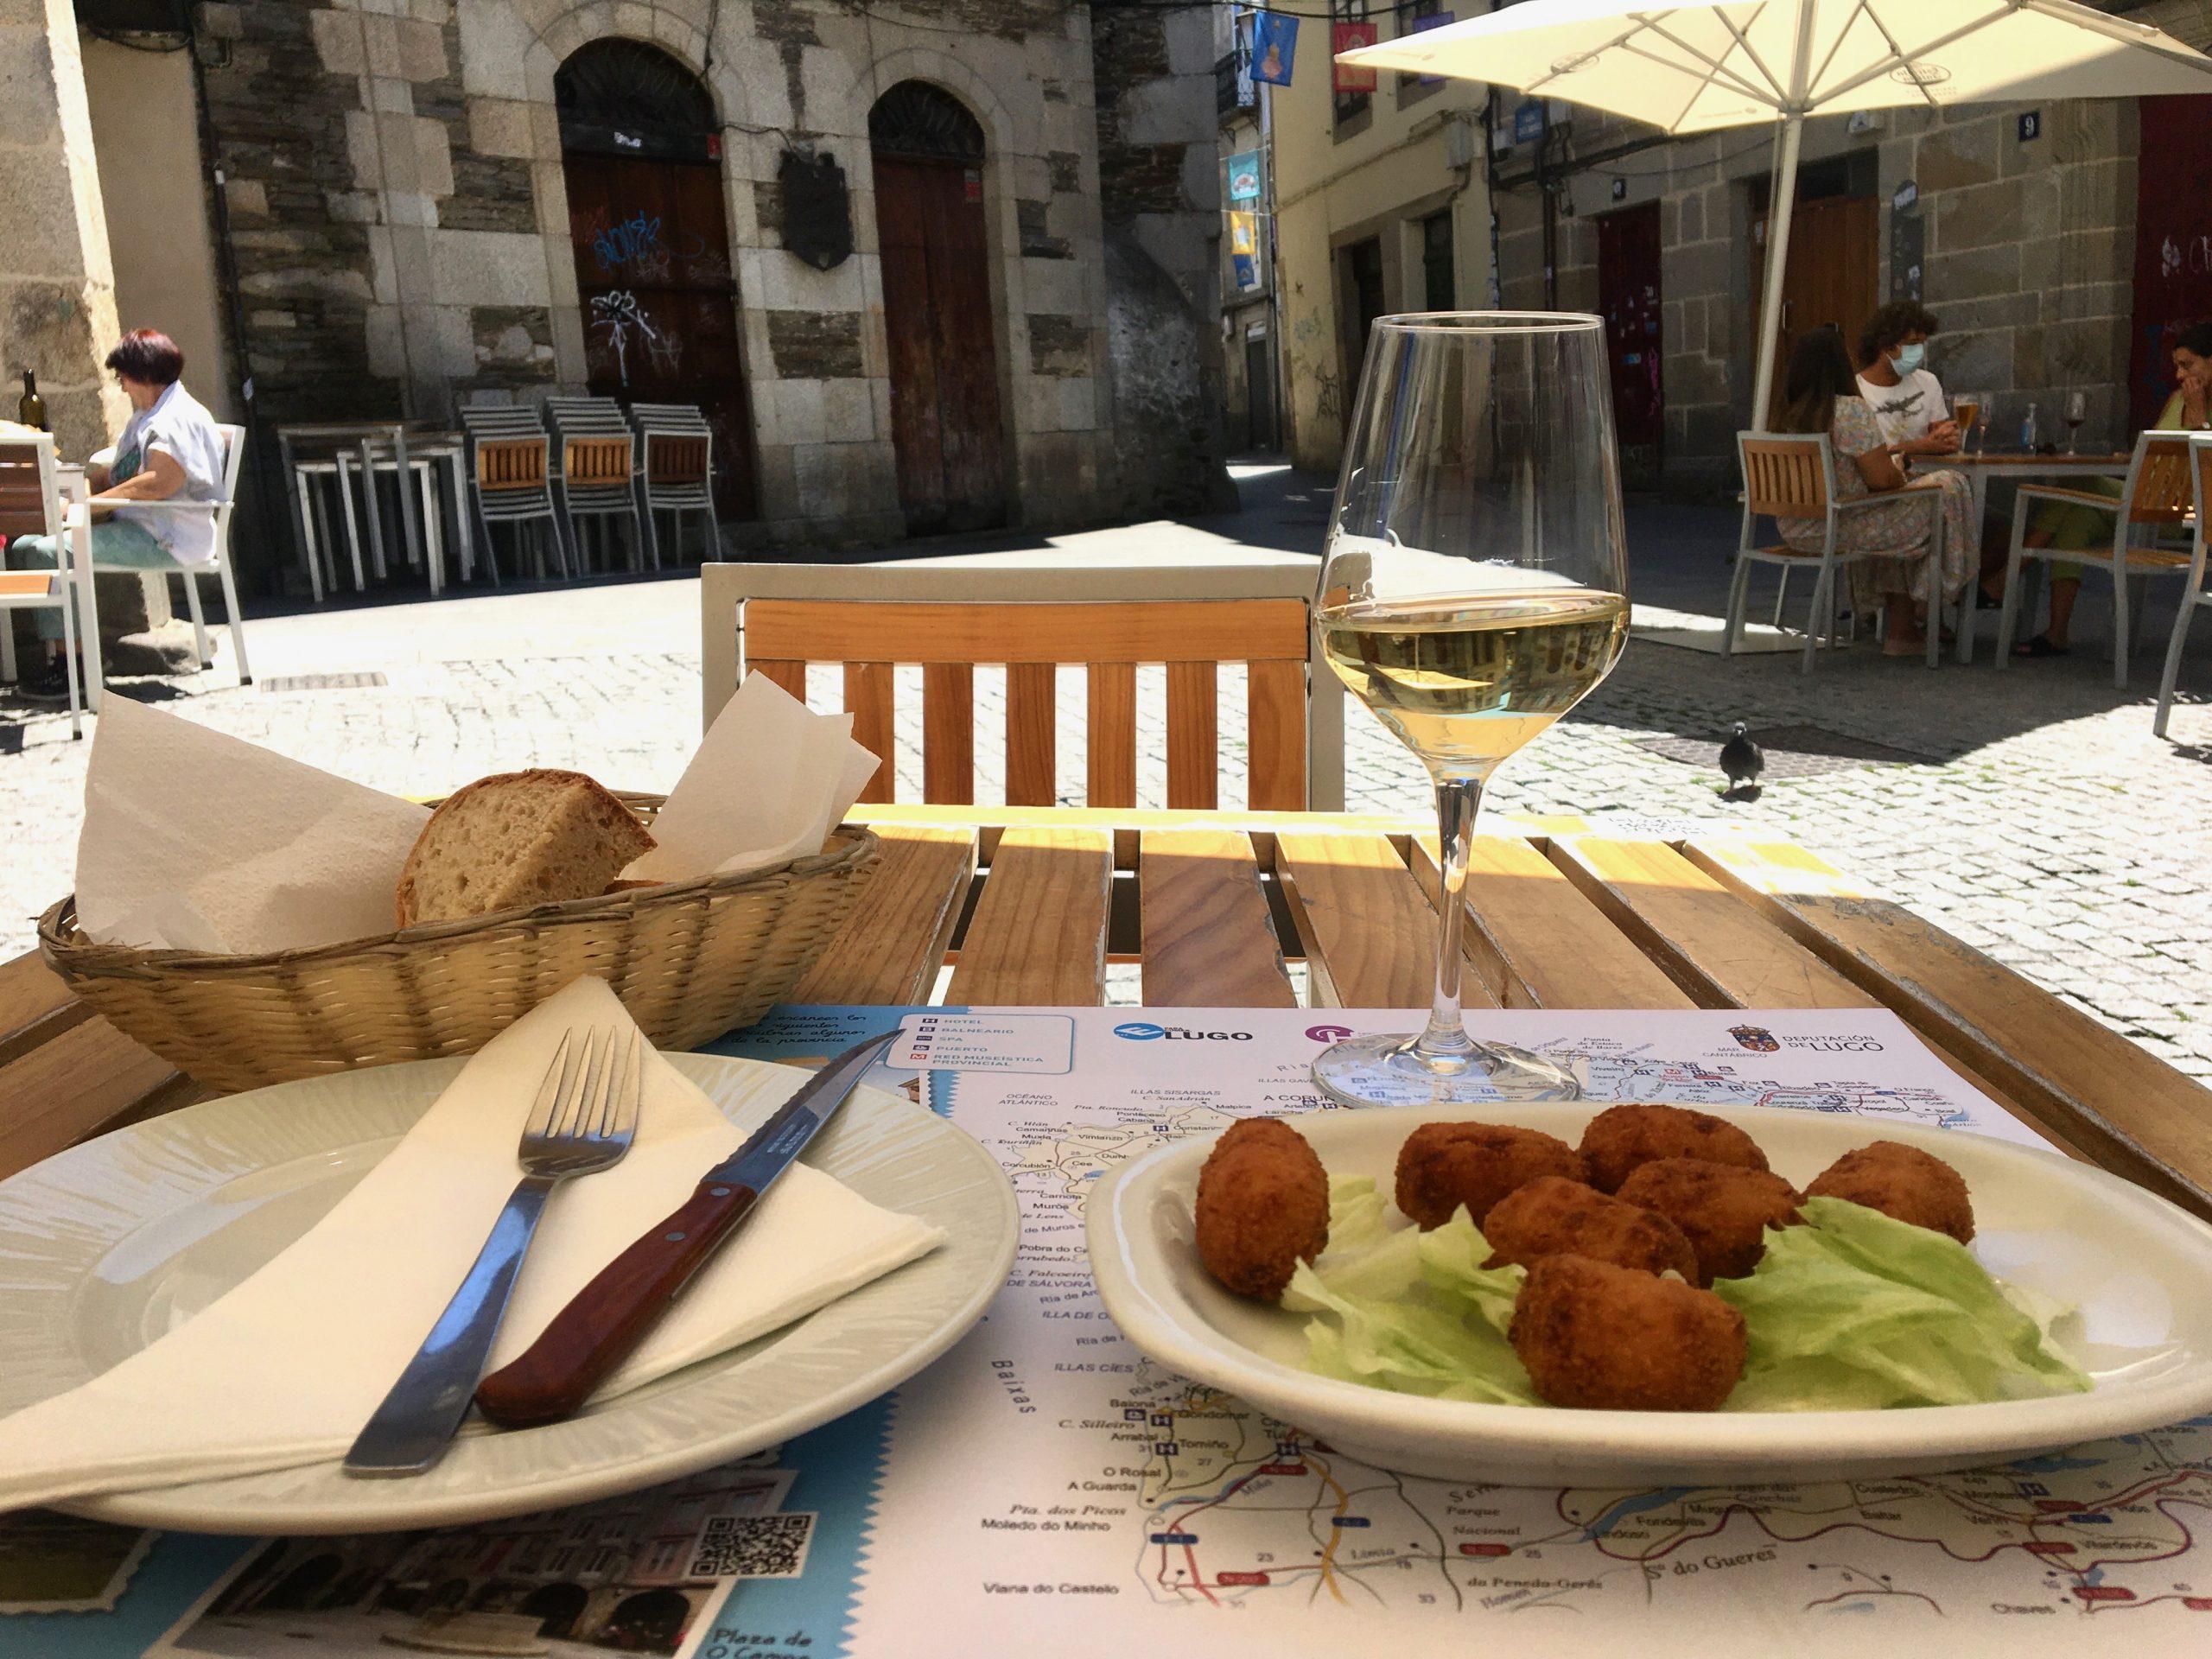 Menu del dia in Lugo, Camino Primitivo